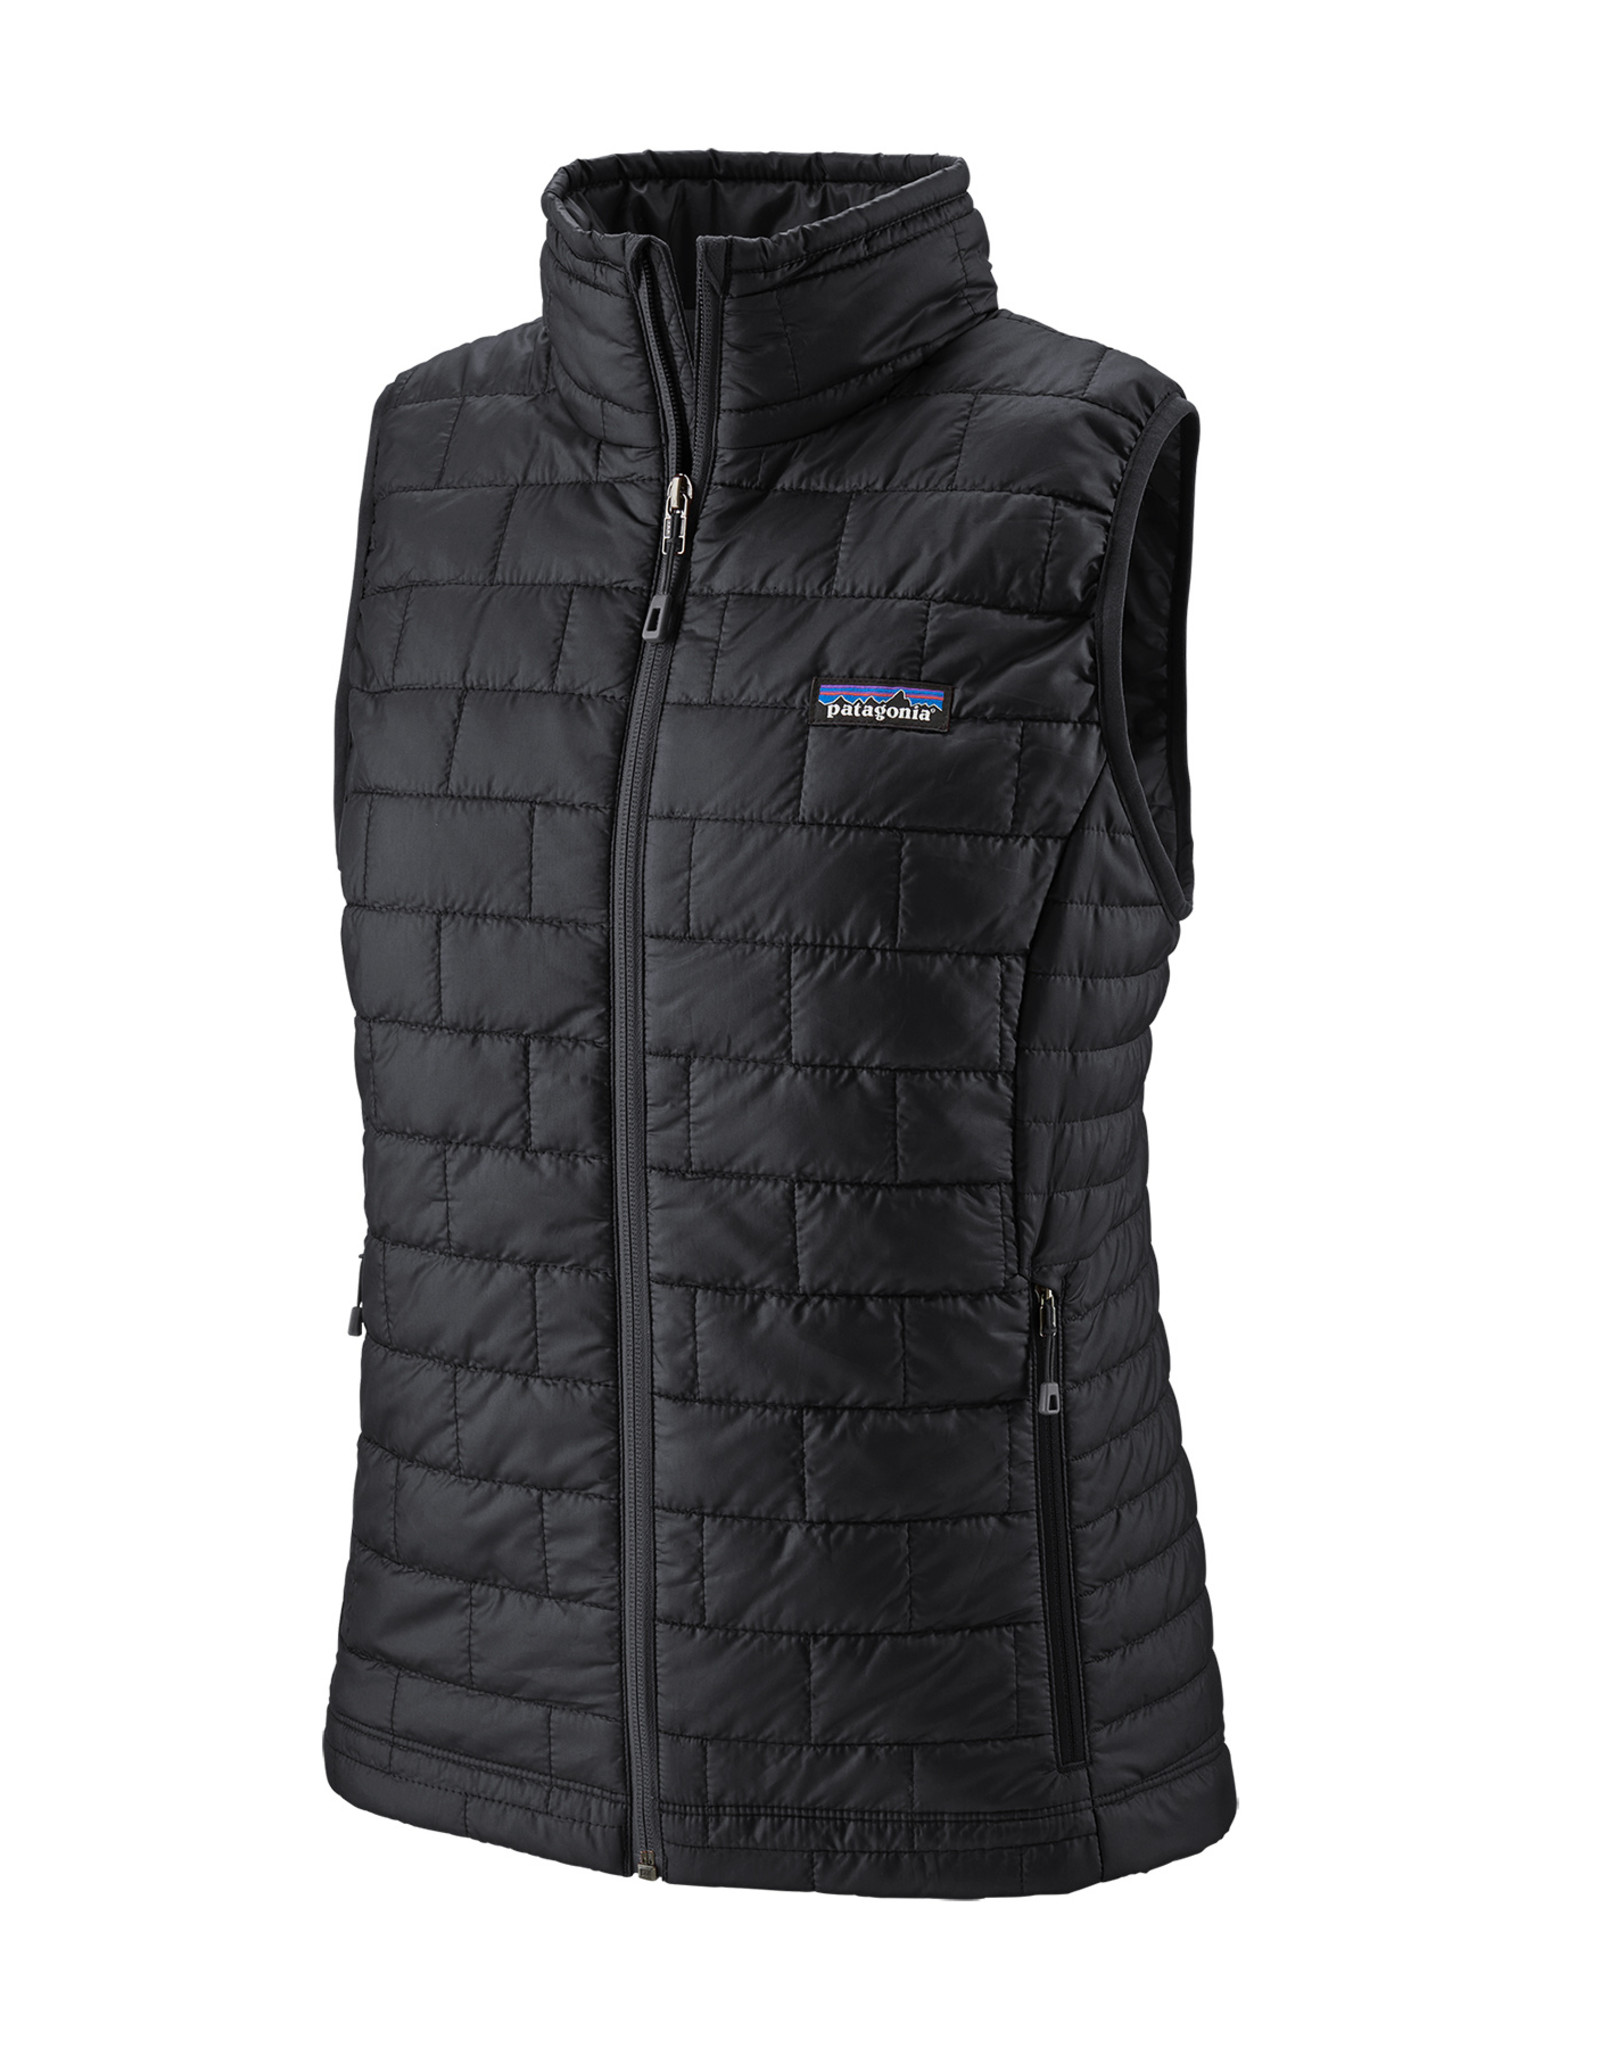 patagonia Nano puff vest dames (ref 84247)